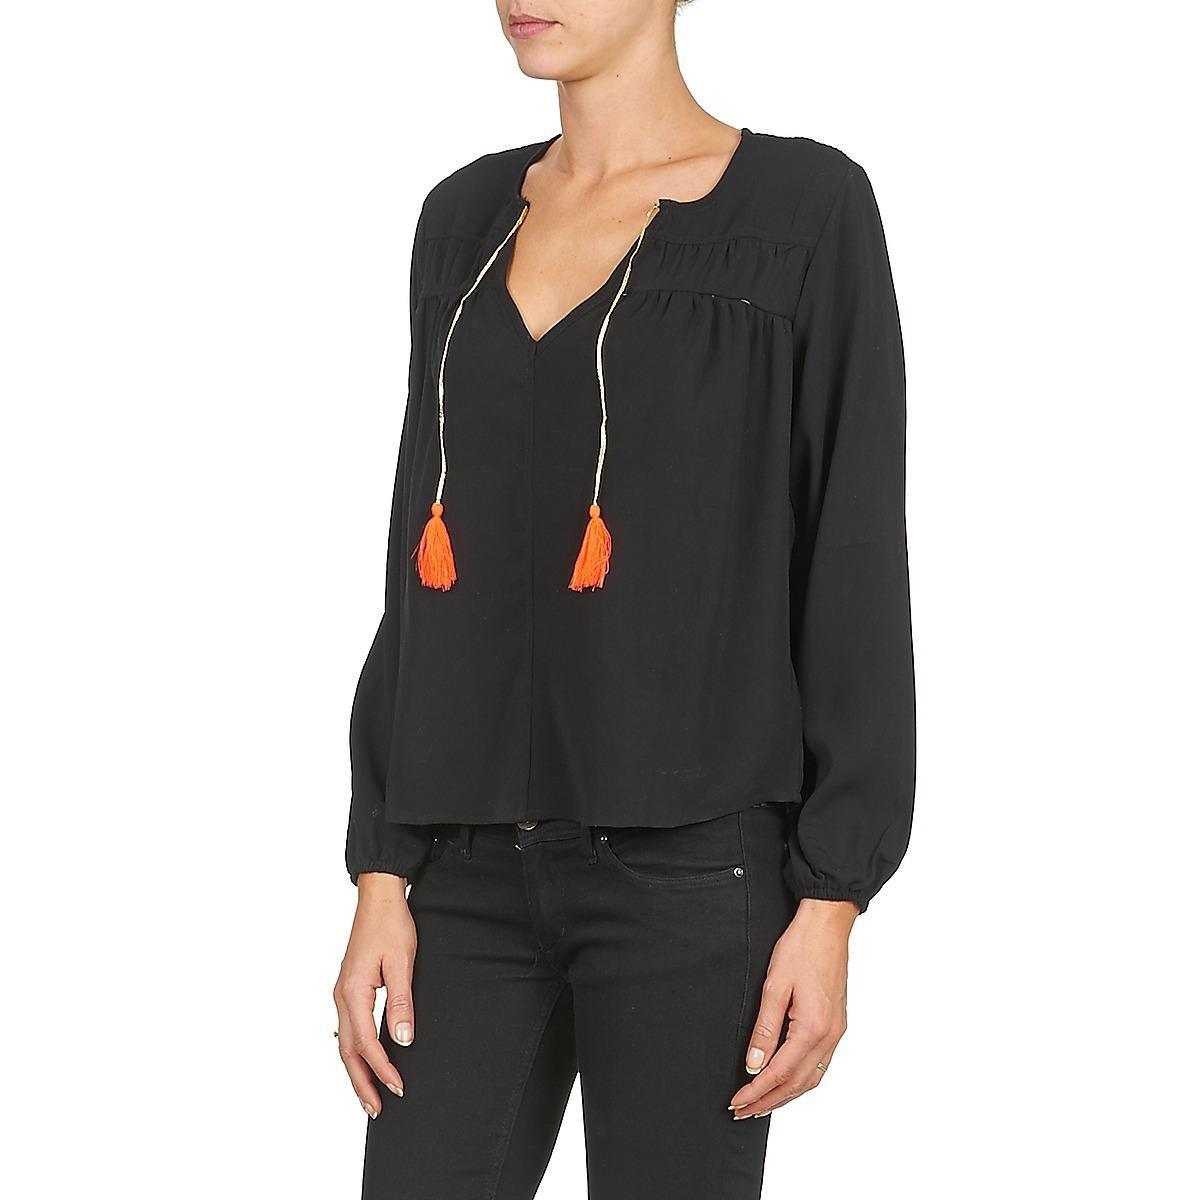 Betty London Dena Women's Blouse In Black - Save 23%